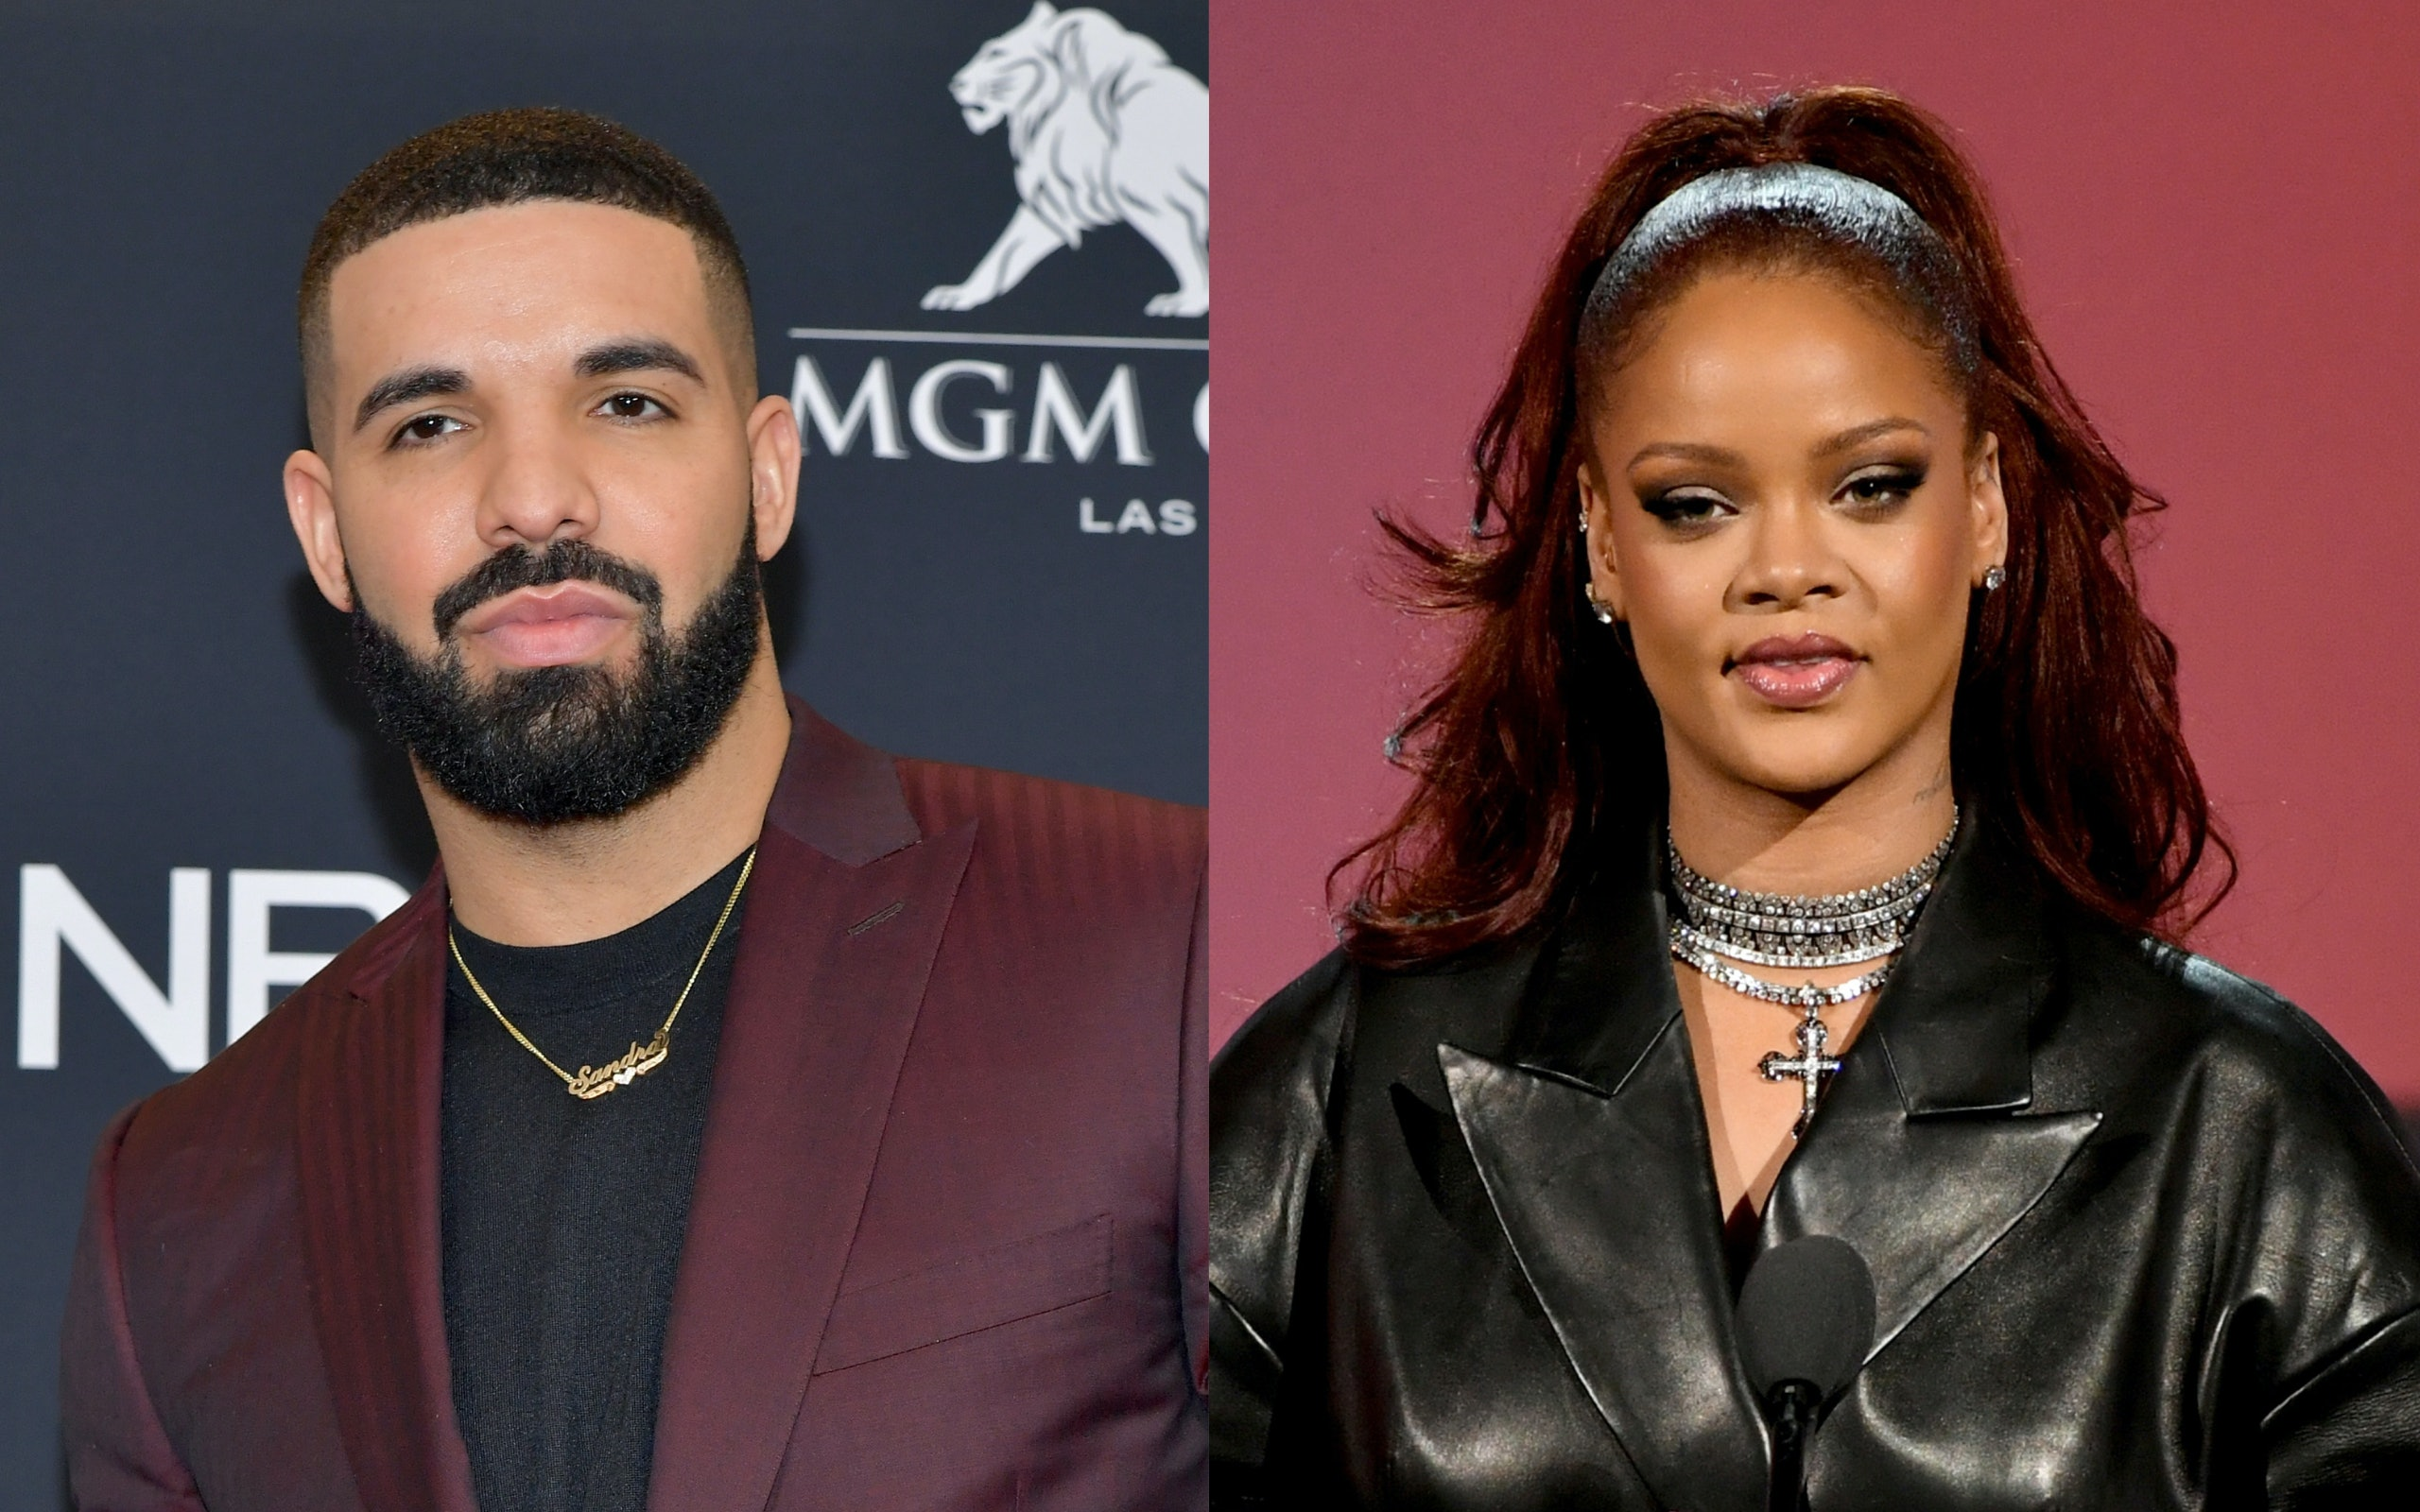 Drake dating Rihanna 2013